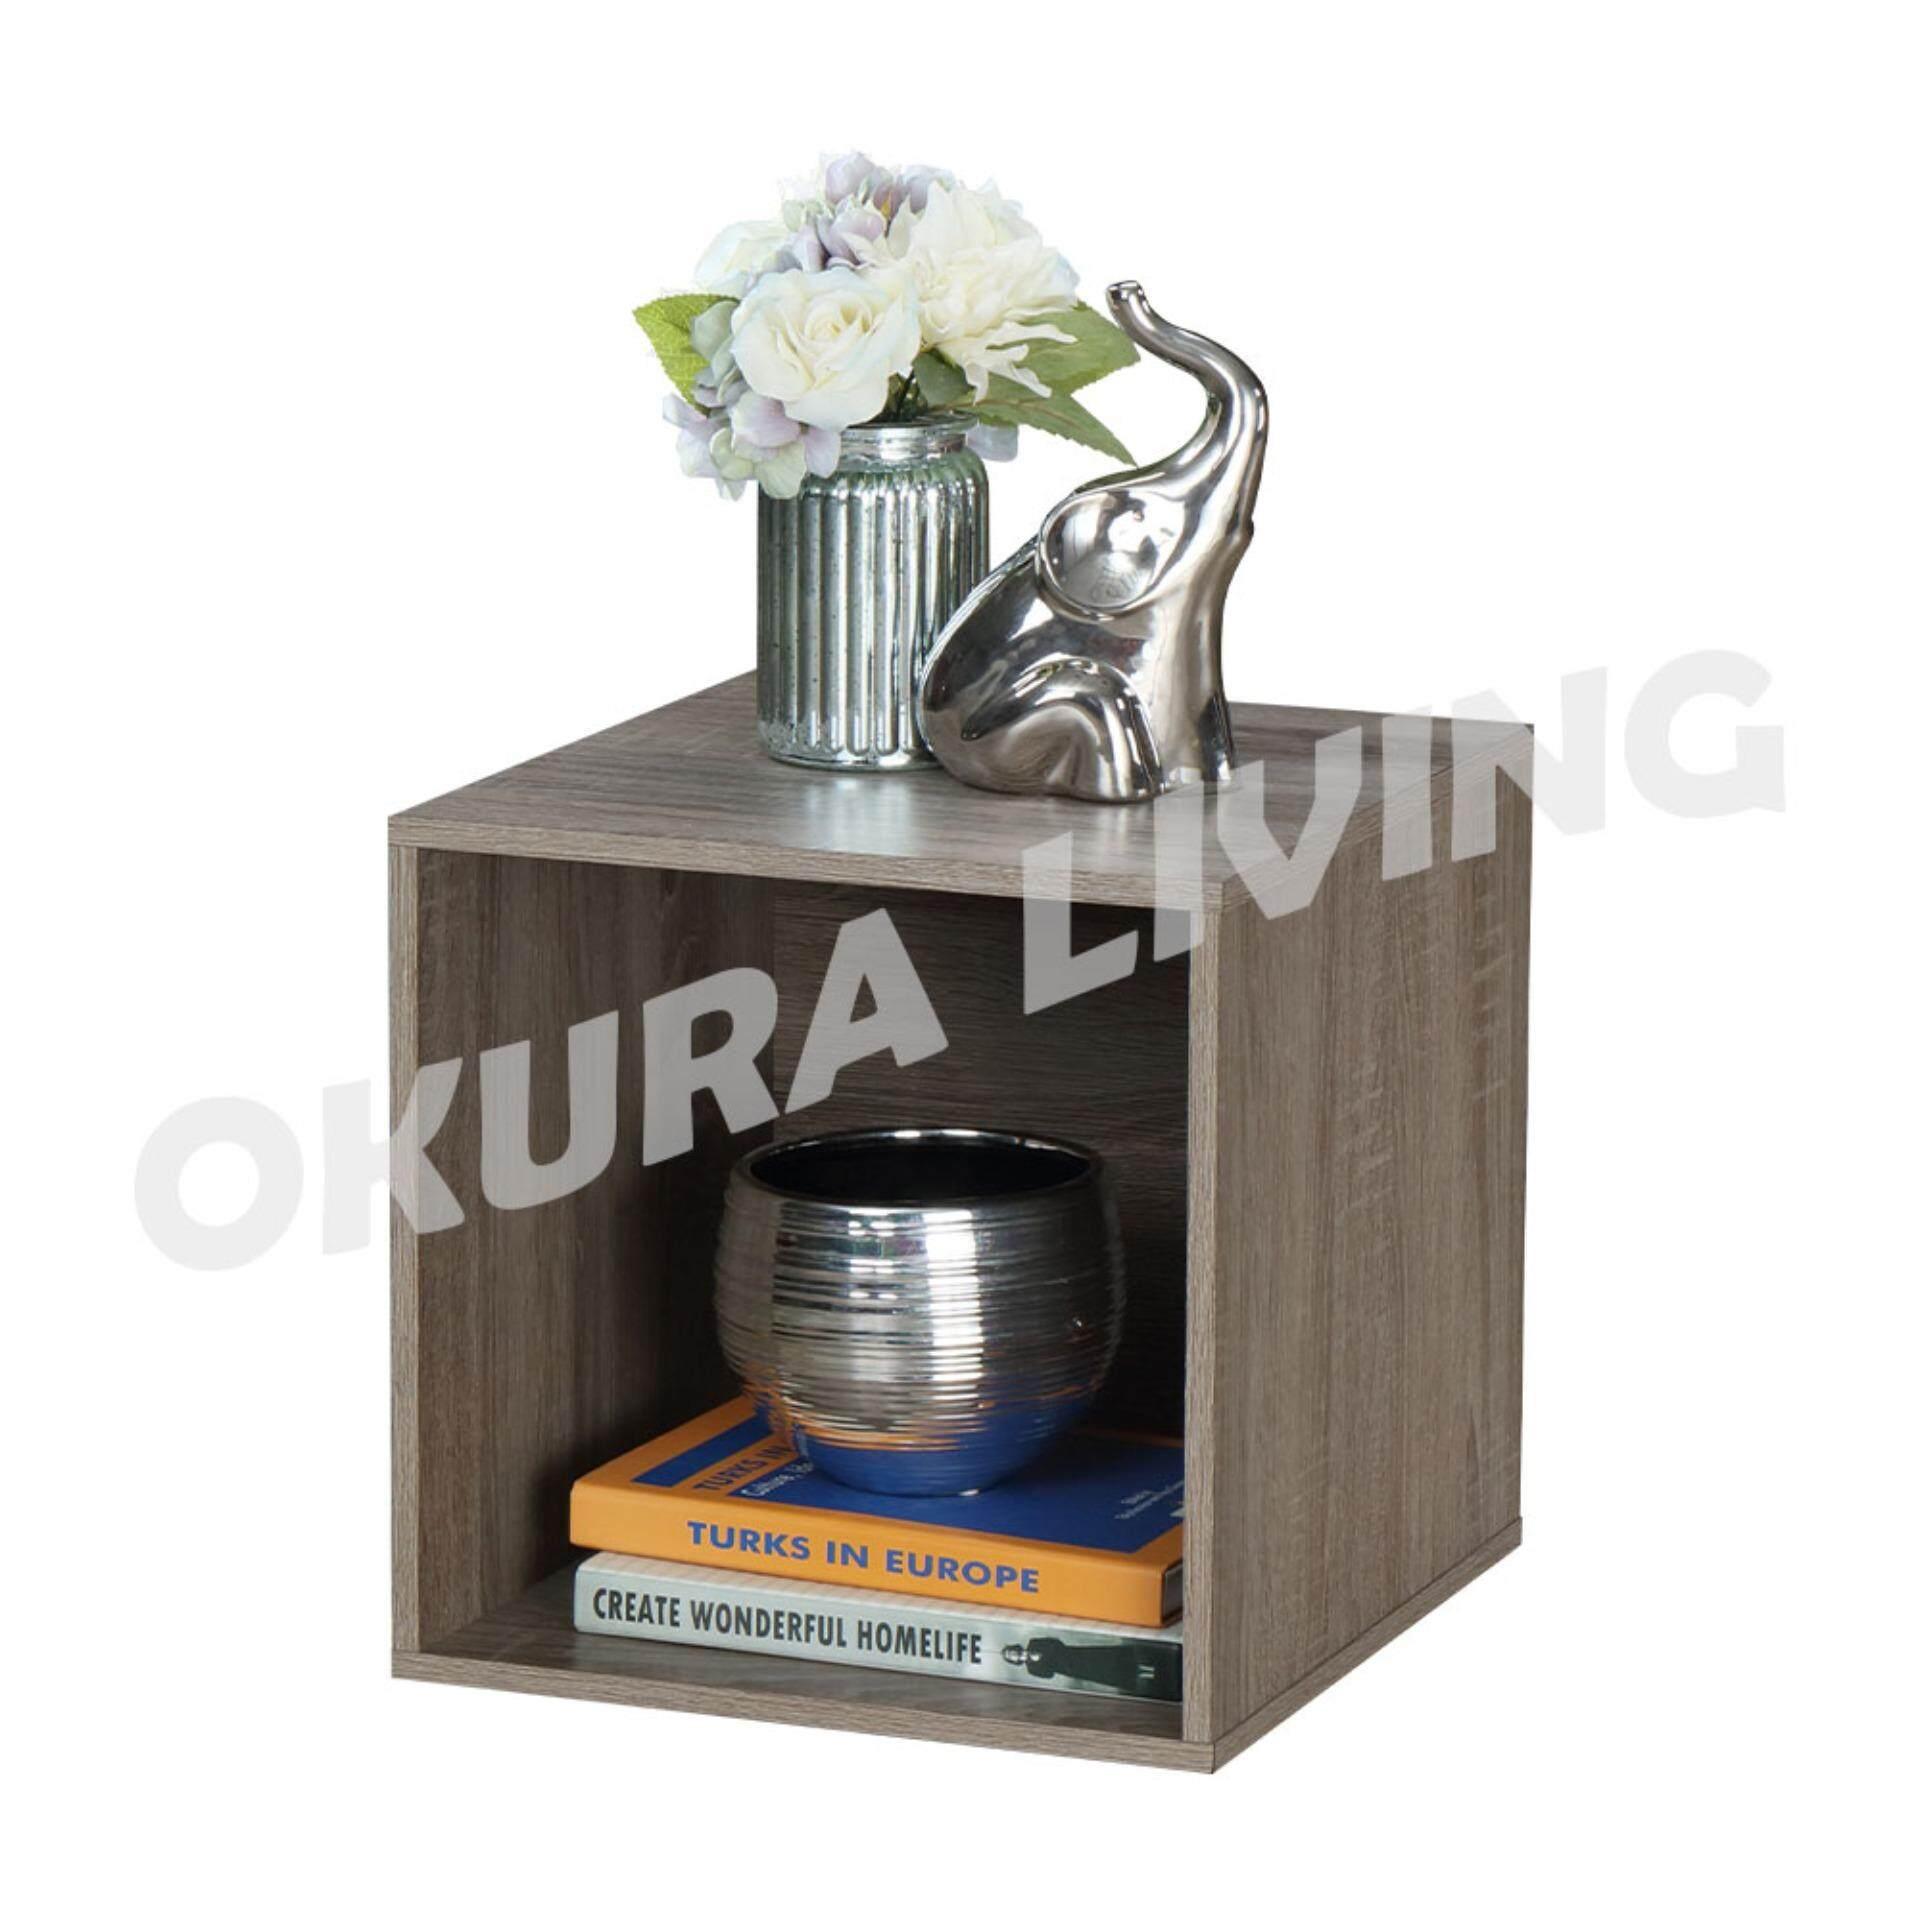 Okura Storage Cube Home Living / Office / Shop Furniture